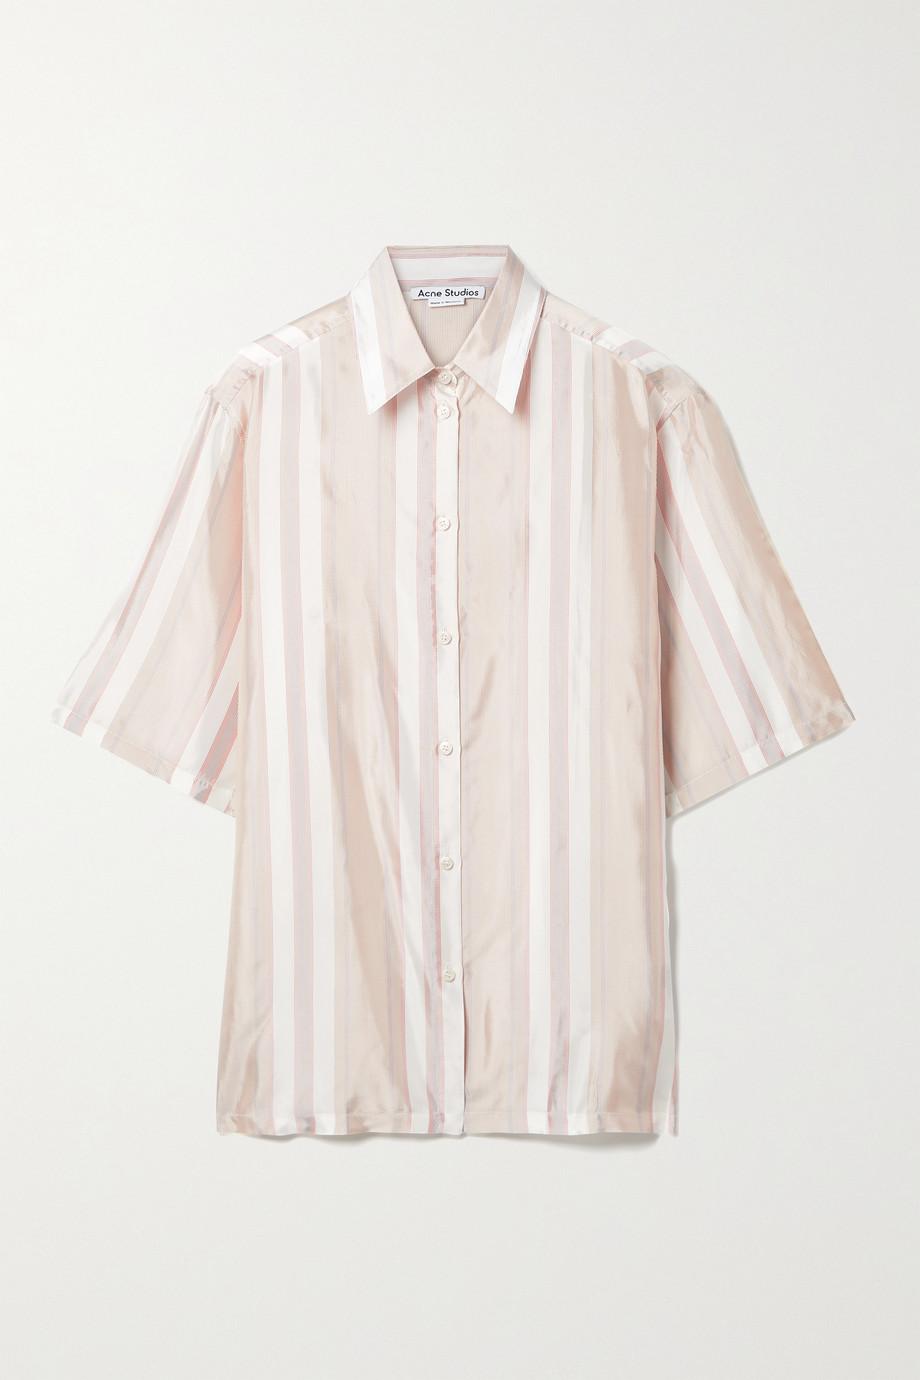 Acne Studios Striped satin shirt